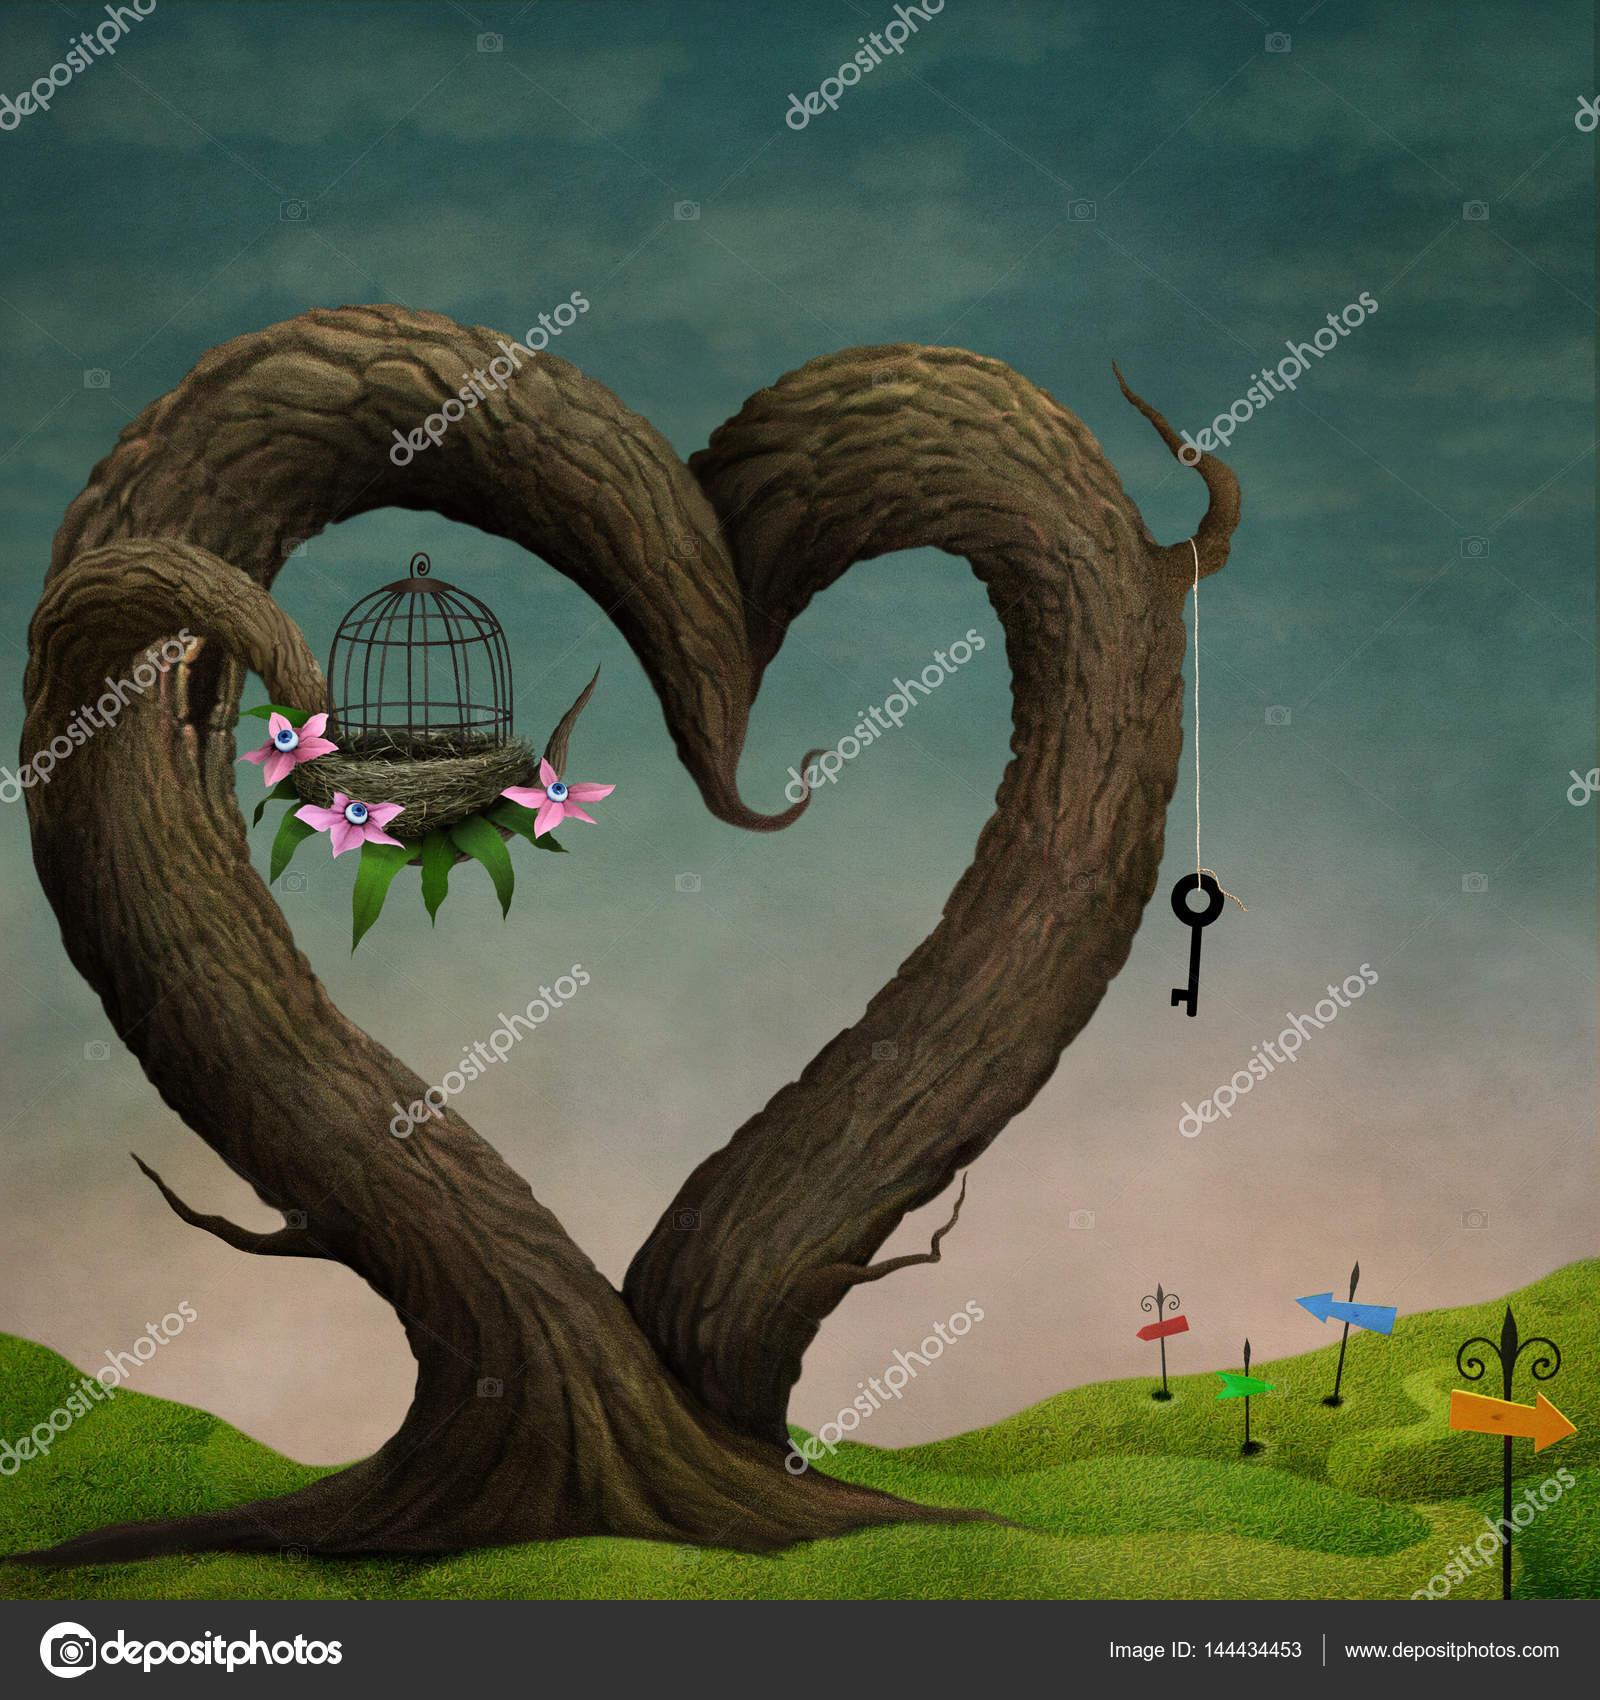 árboles Extrañamente Mágico En Forma De Corazón Fotos De Stock